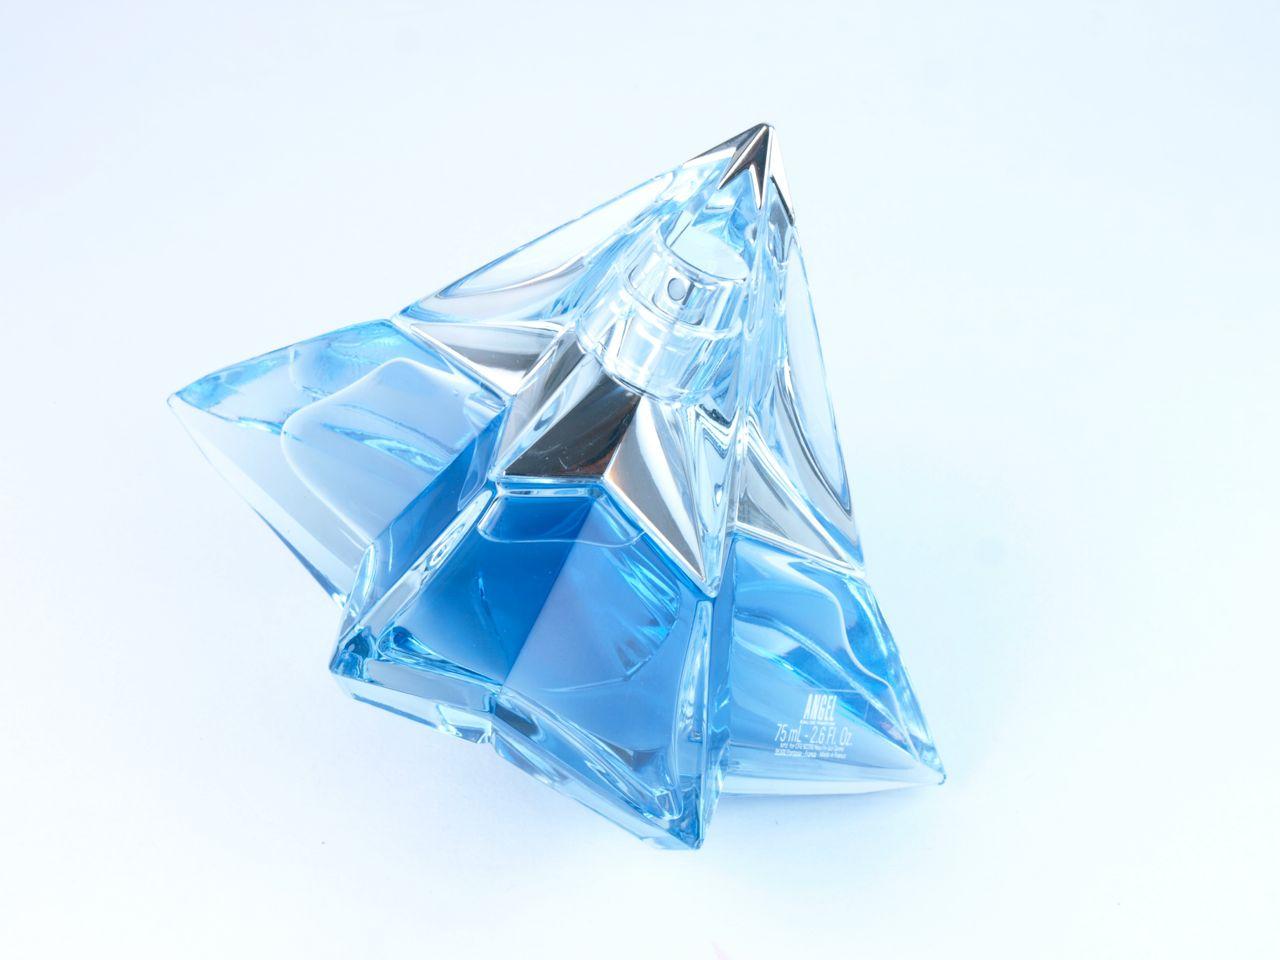 thierry mugler angel the new star eau de parfum review. Black Bedroom Furniture Sets. Home Design Ideas